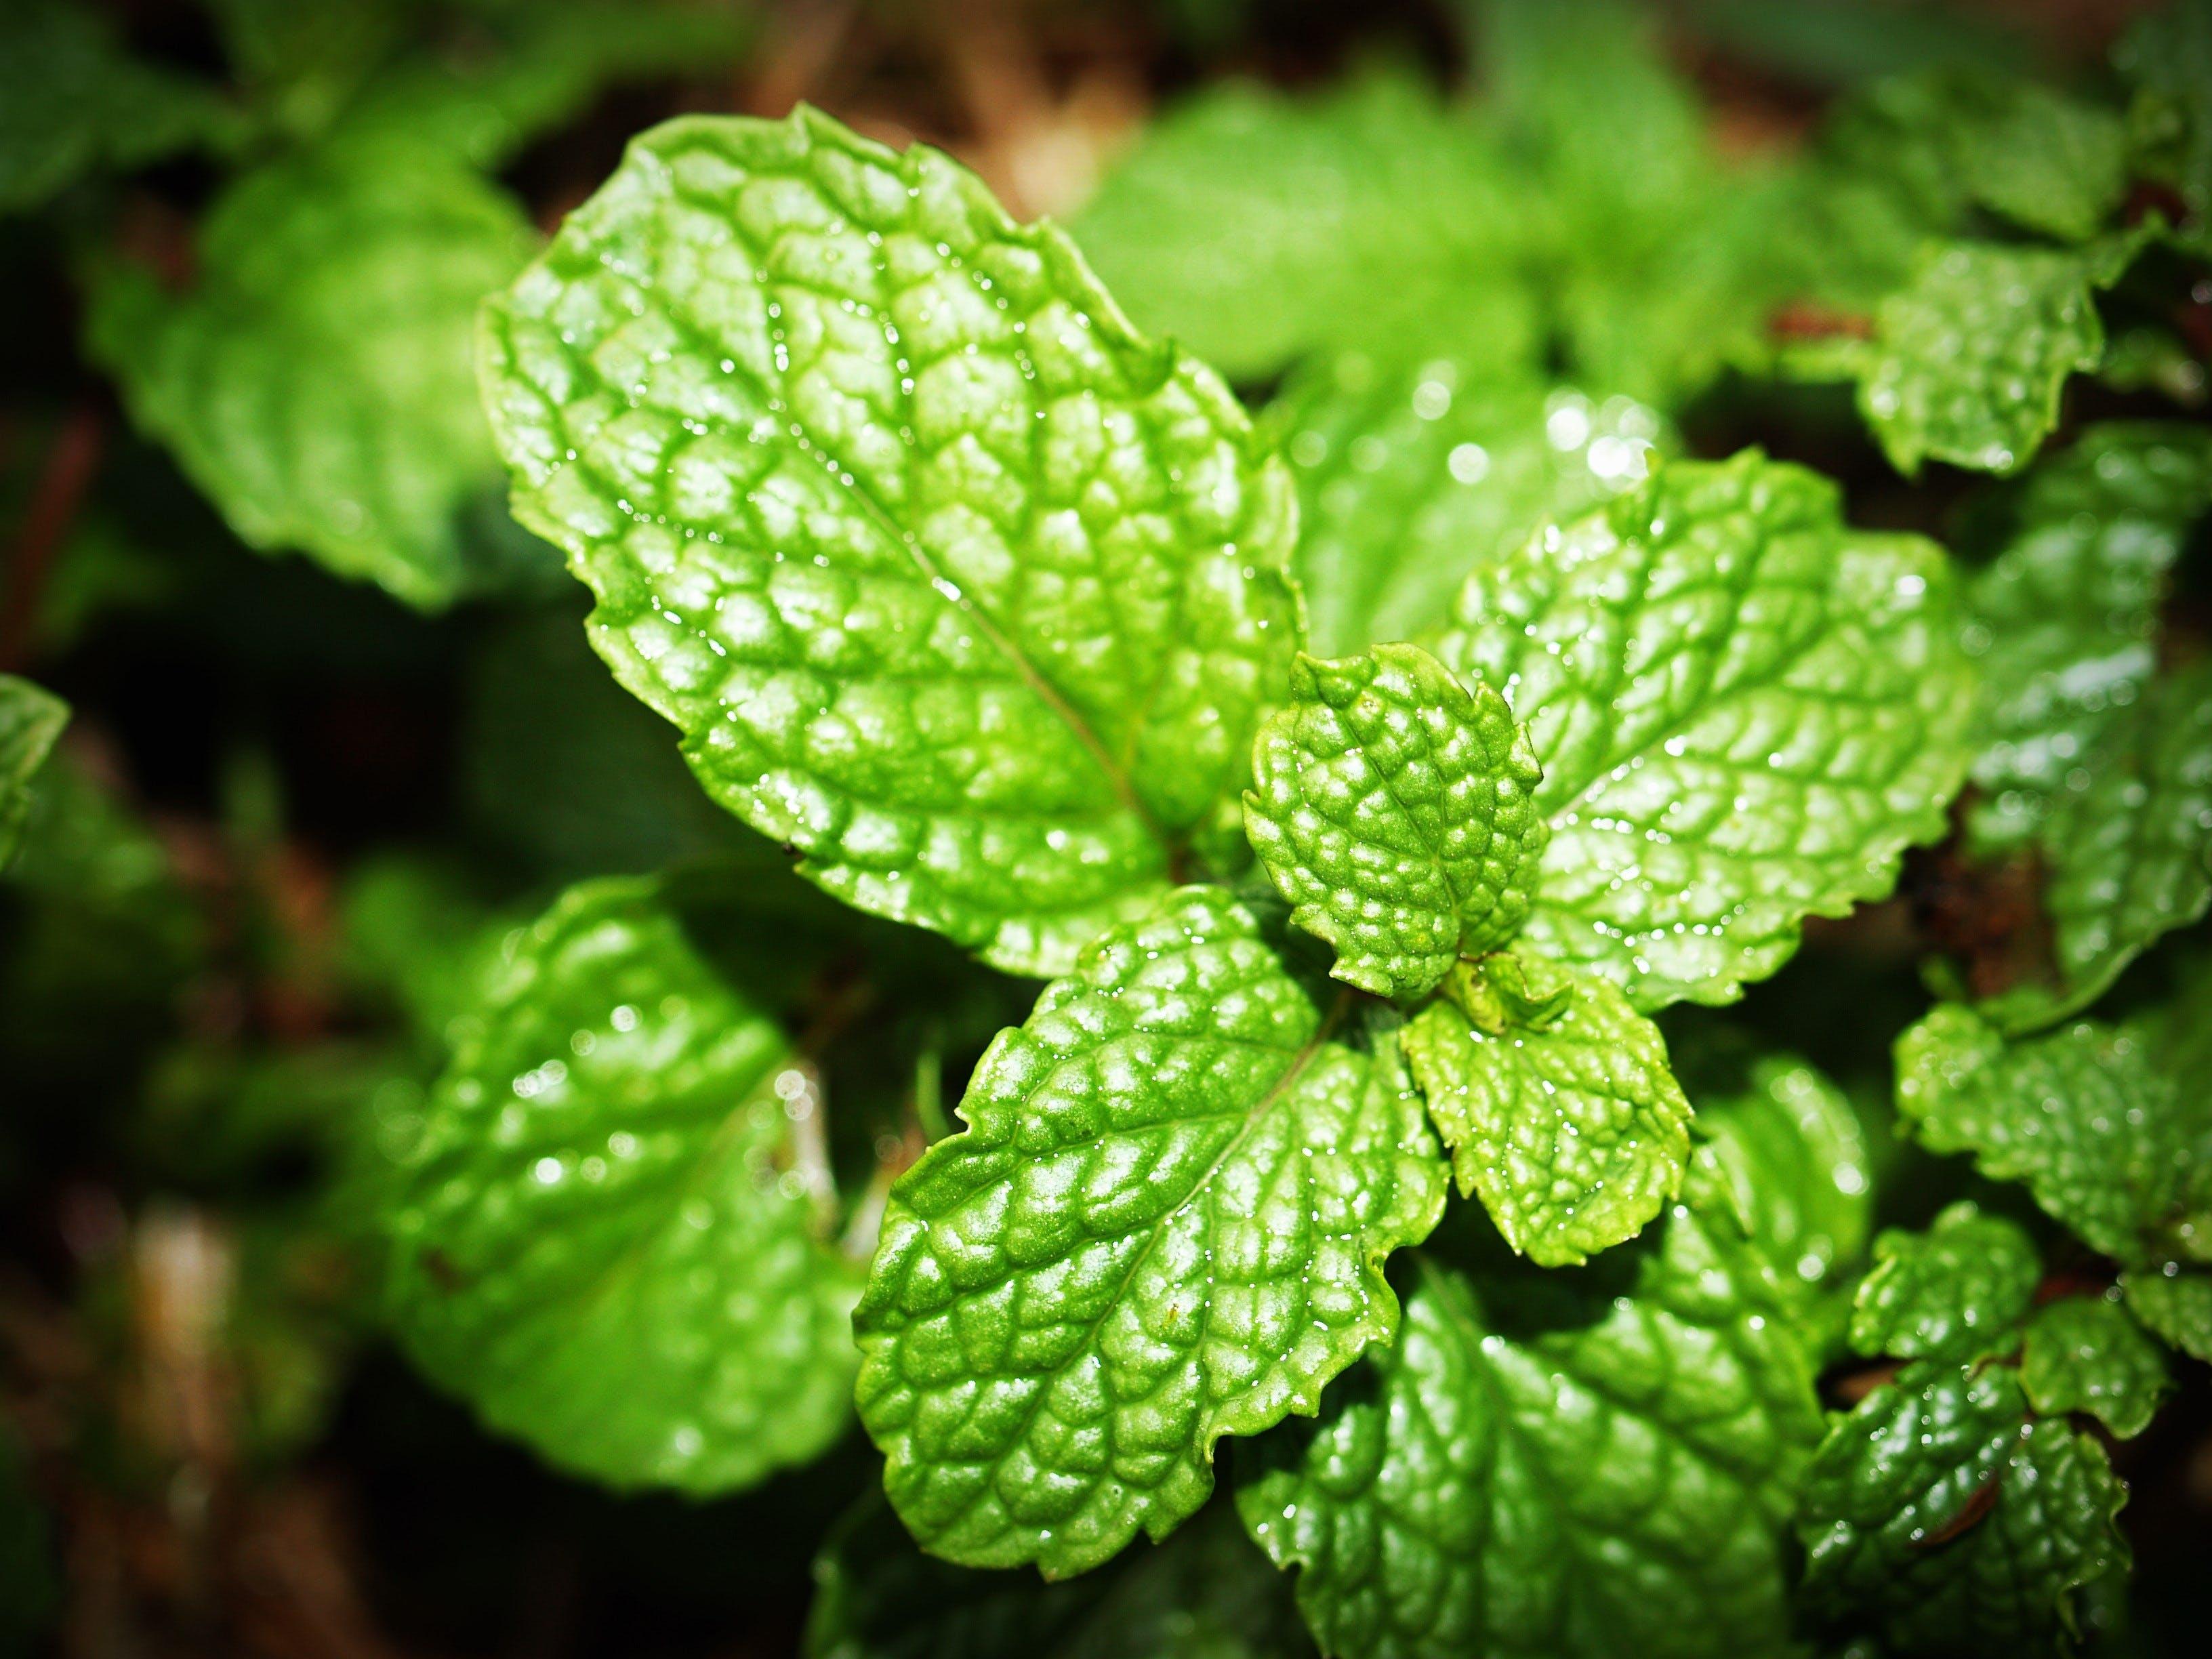 Green Herbal Leaf